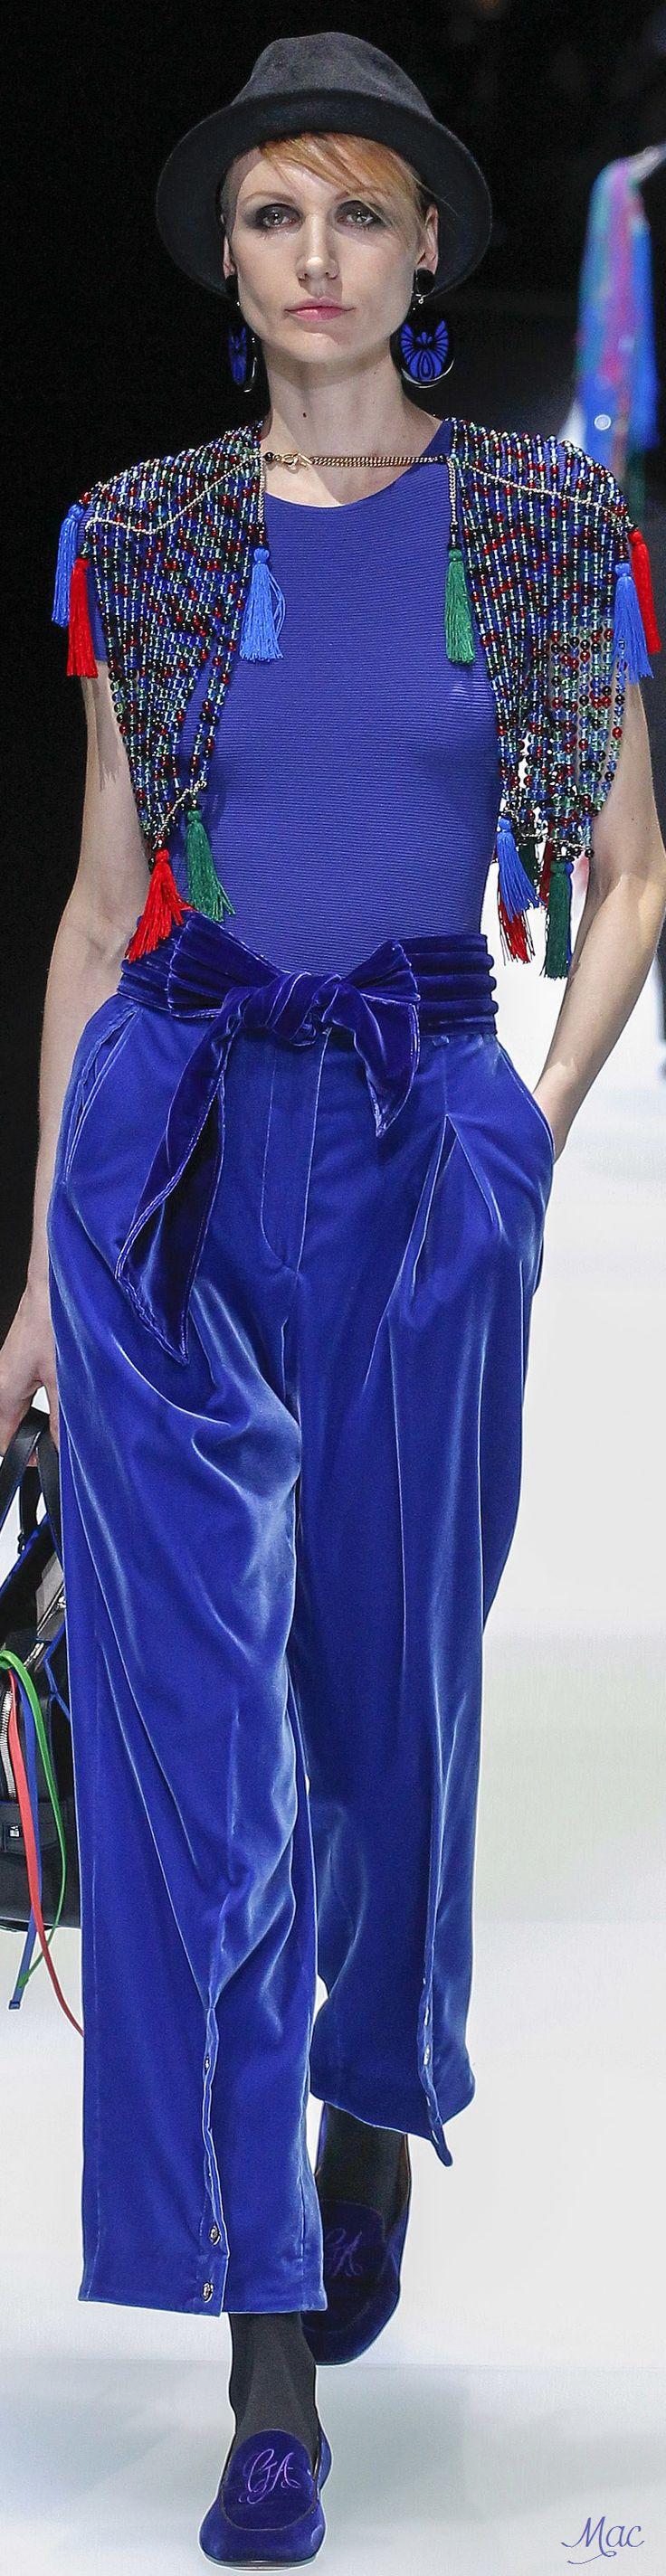 1377 best Royal Blue images on Pinterest | Royal blue, Block dress ...